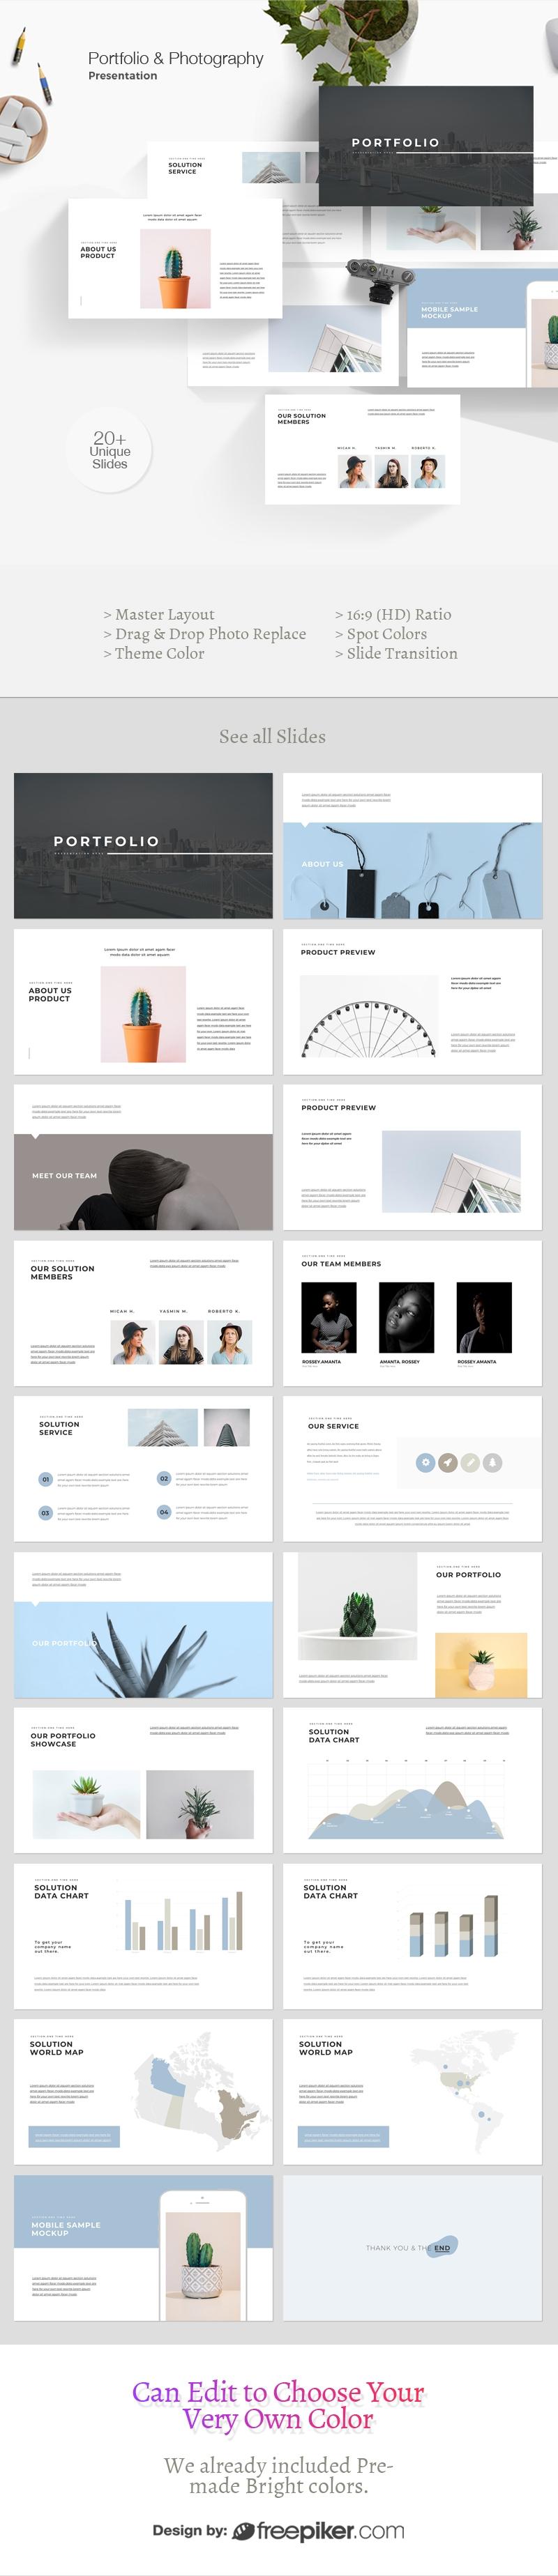 Portfolio & Photography Powerpoint Template